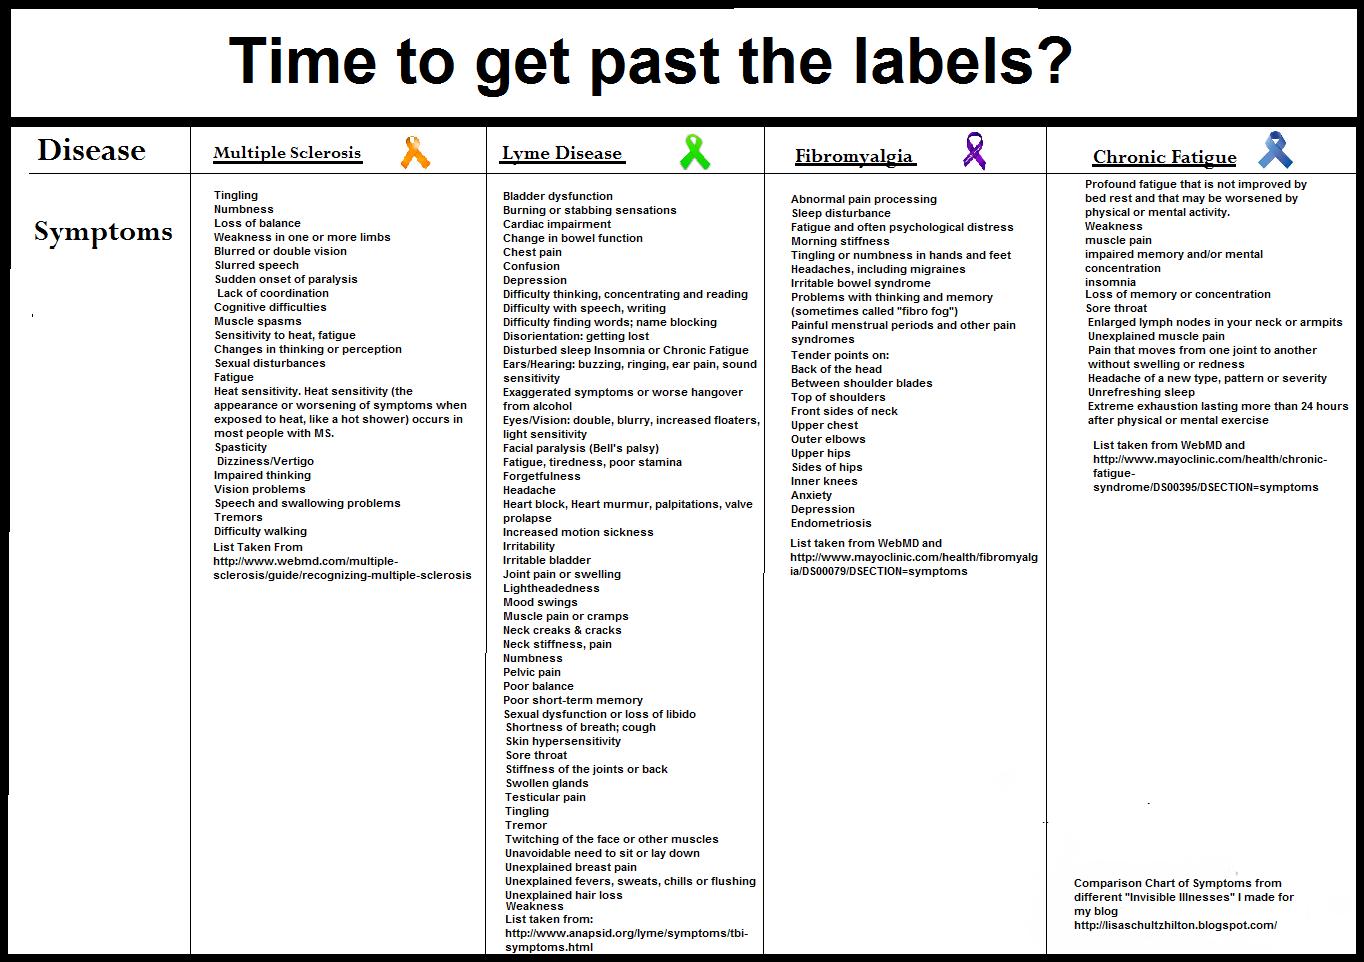 comparison of lyme, ms, fibro and cfs symptoms & link: studies show